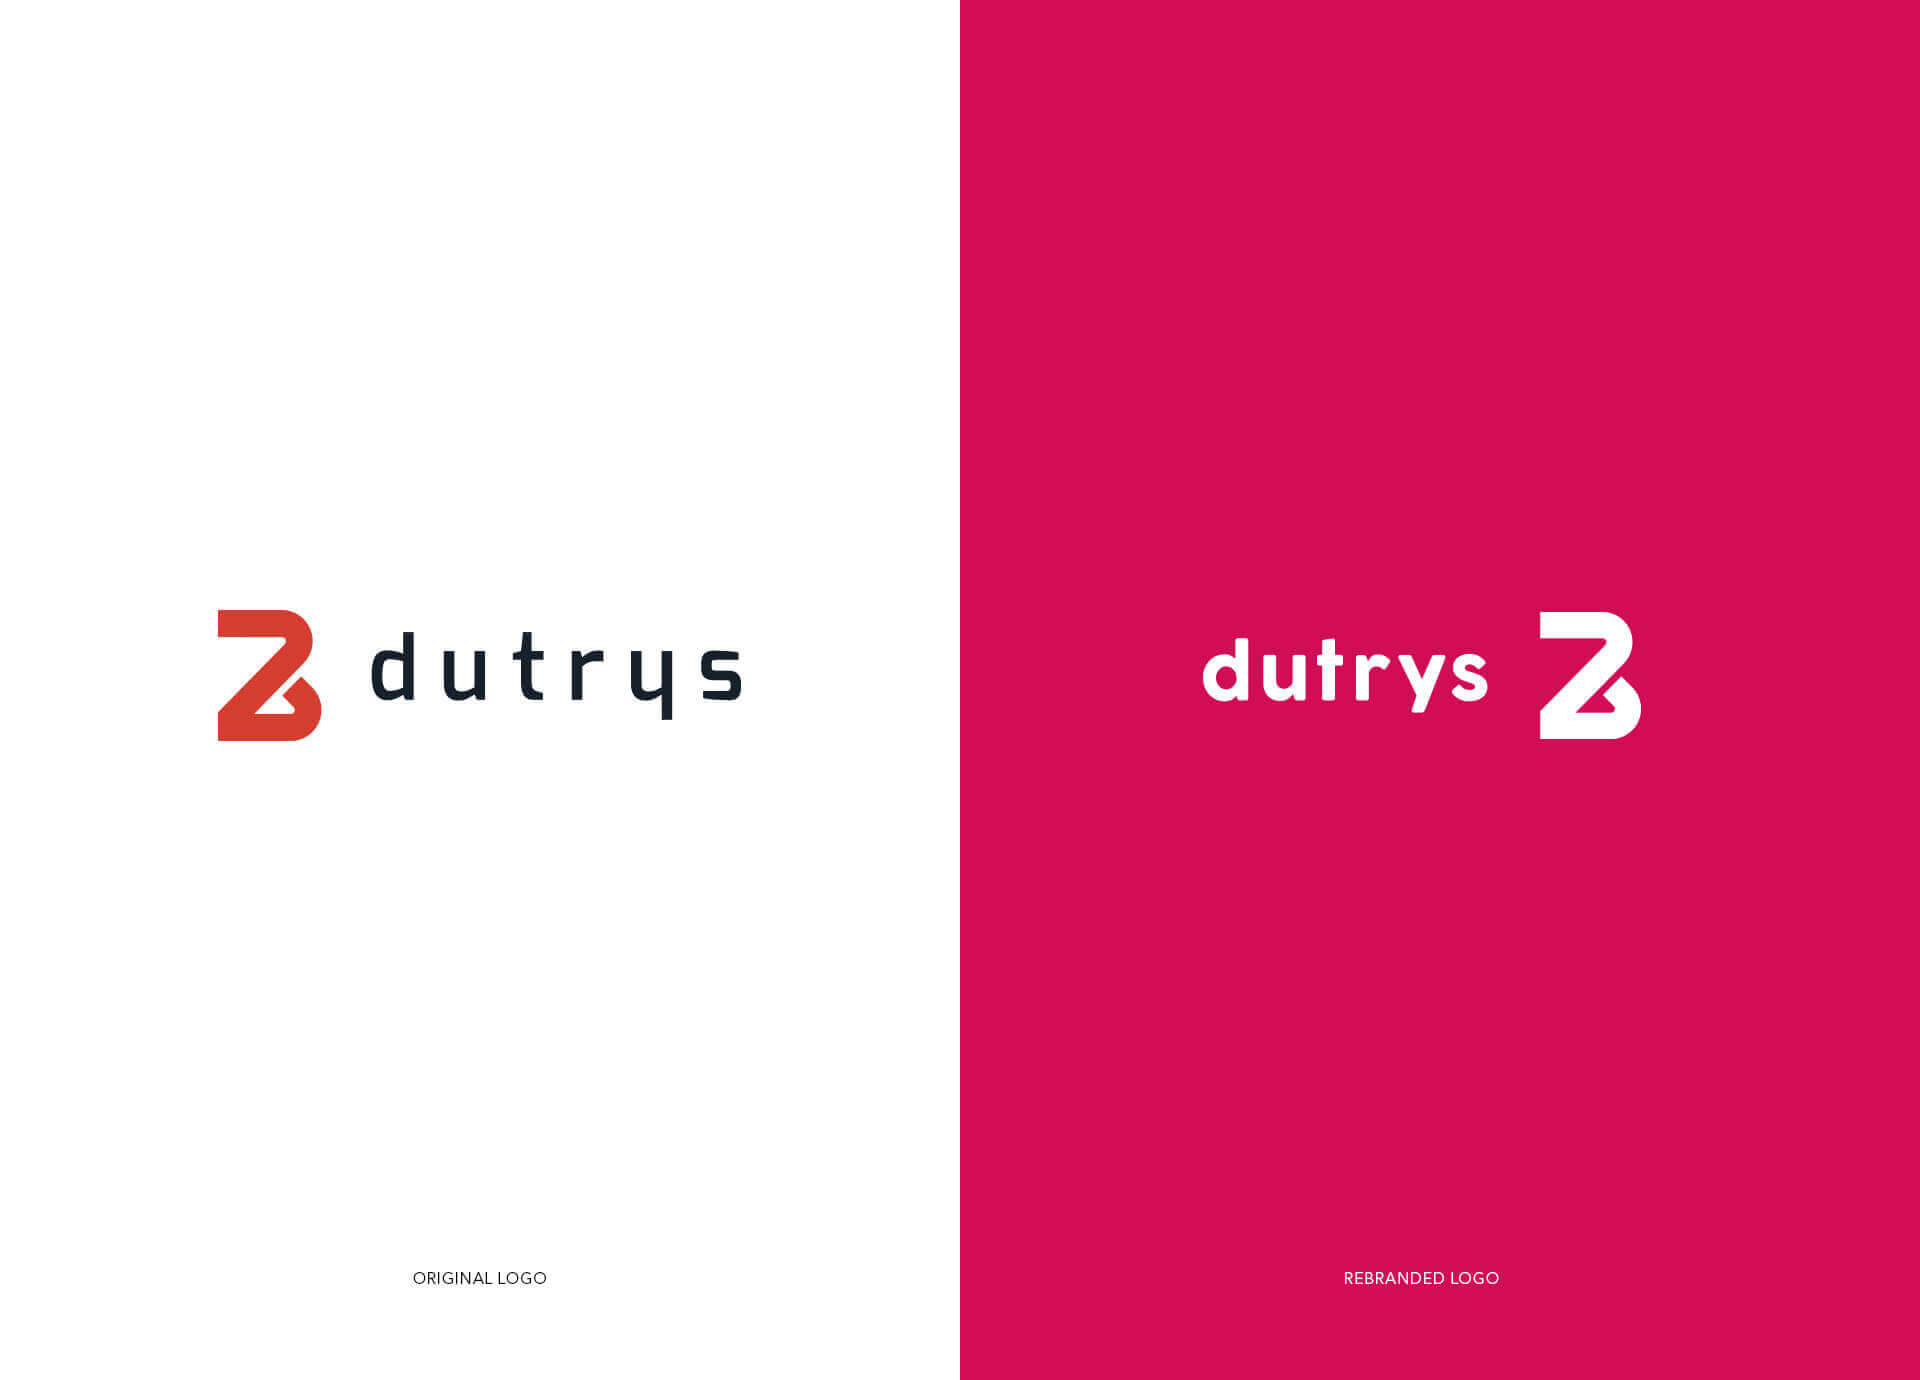 1_Du-trys_logo-1920x1380